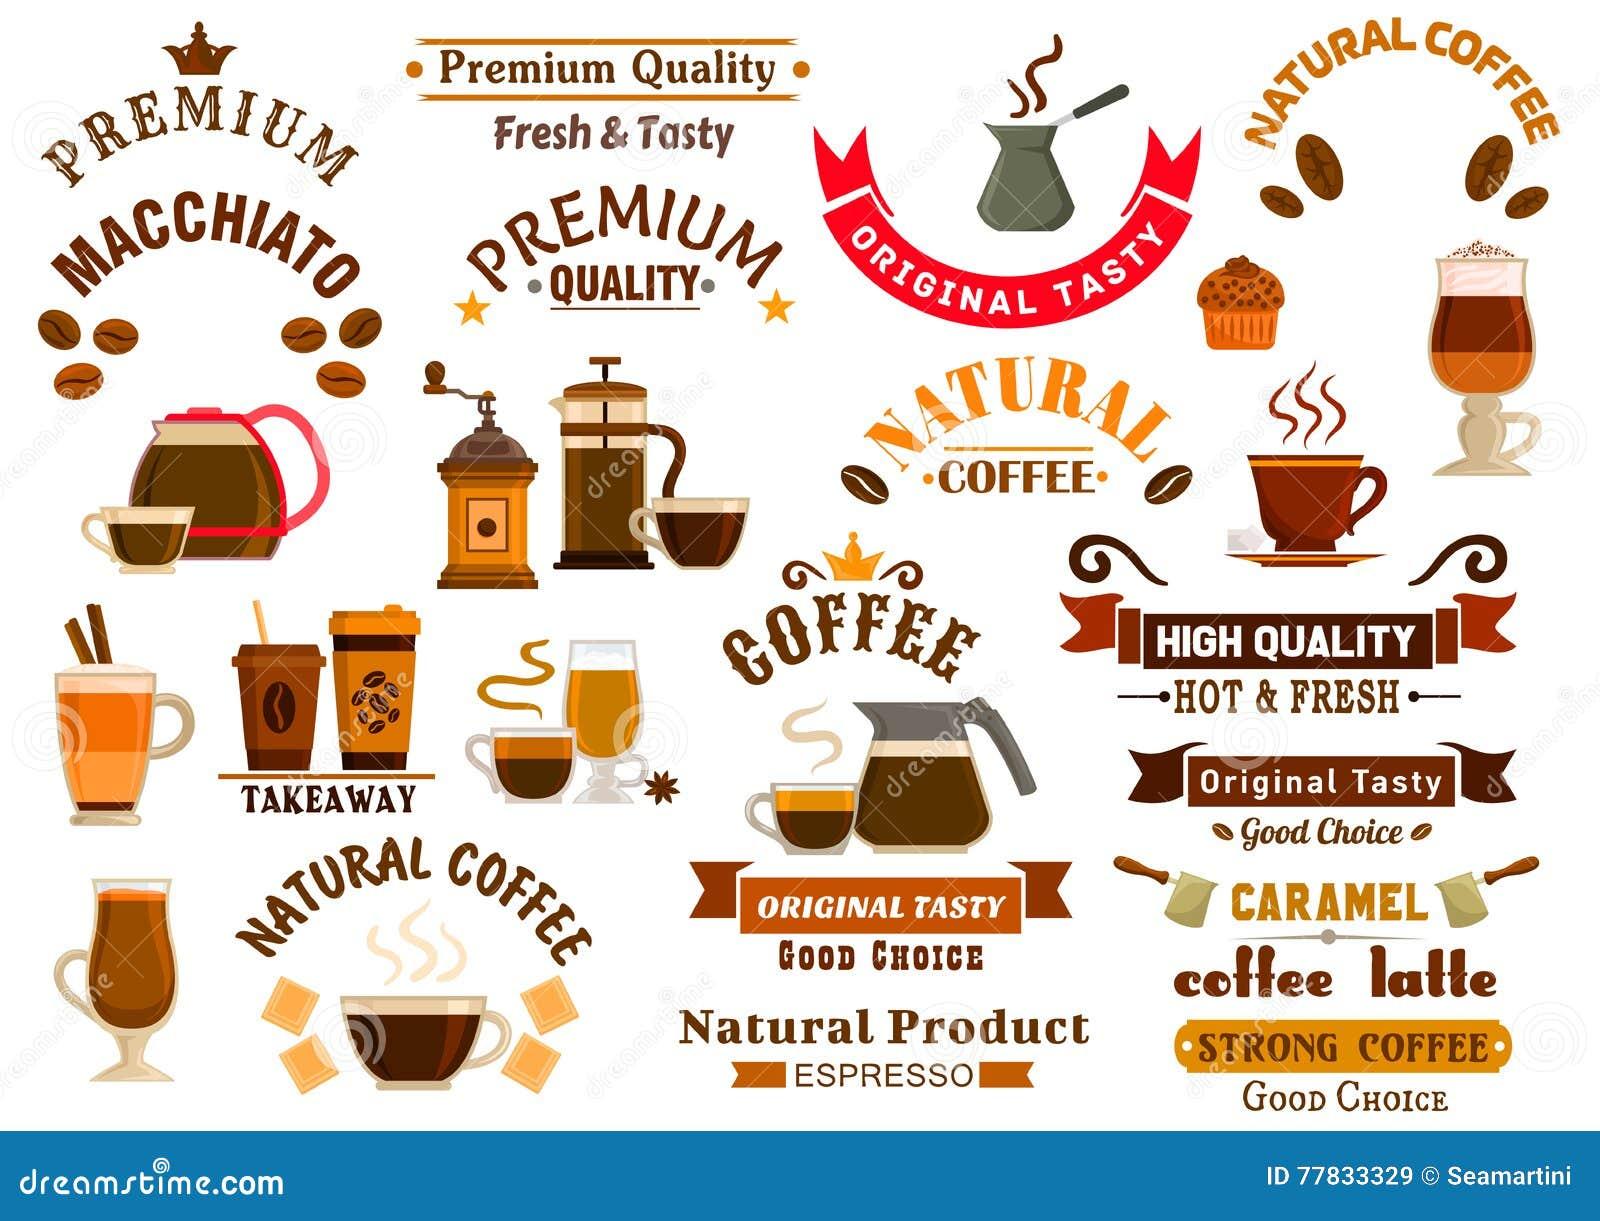 Coffee and desserts icons for cafe signboards stock vector for 10 reglas para el salon de clases en ingles